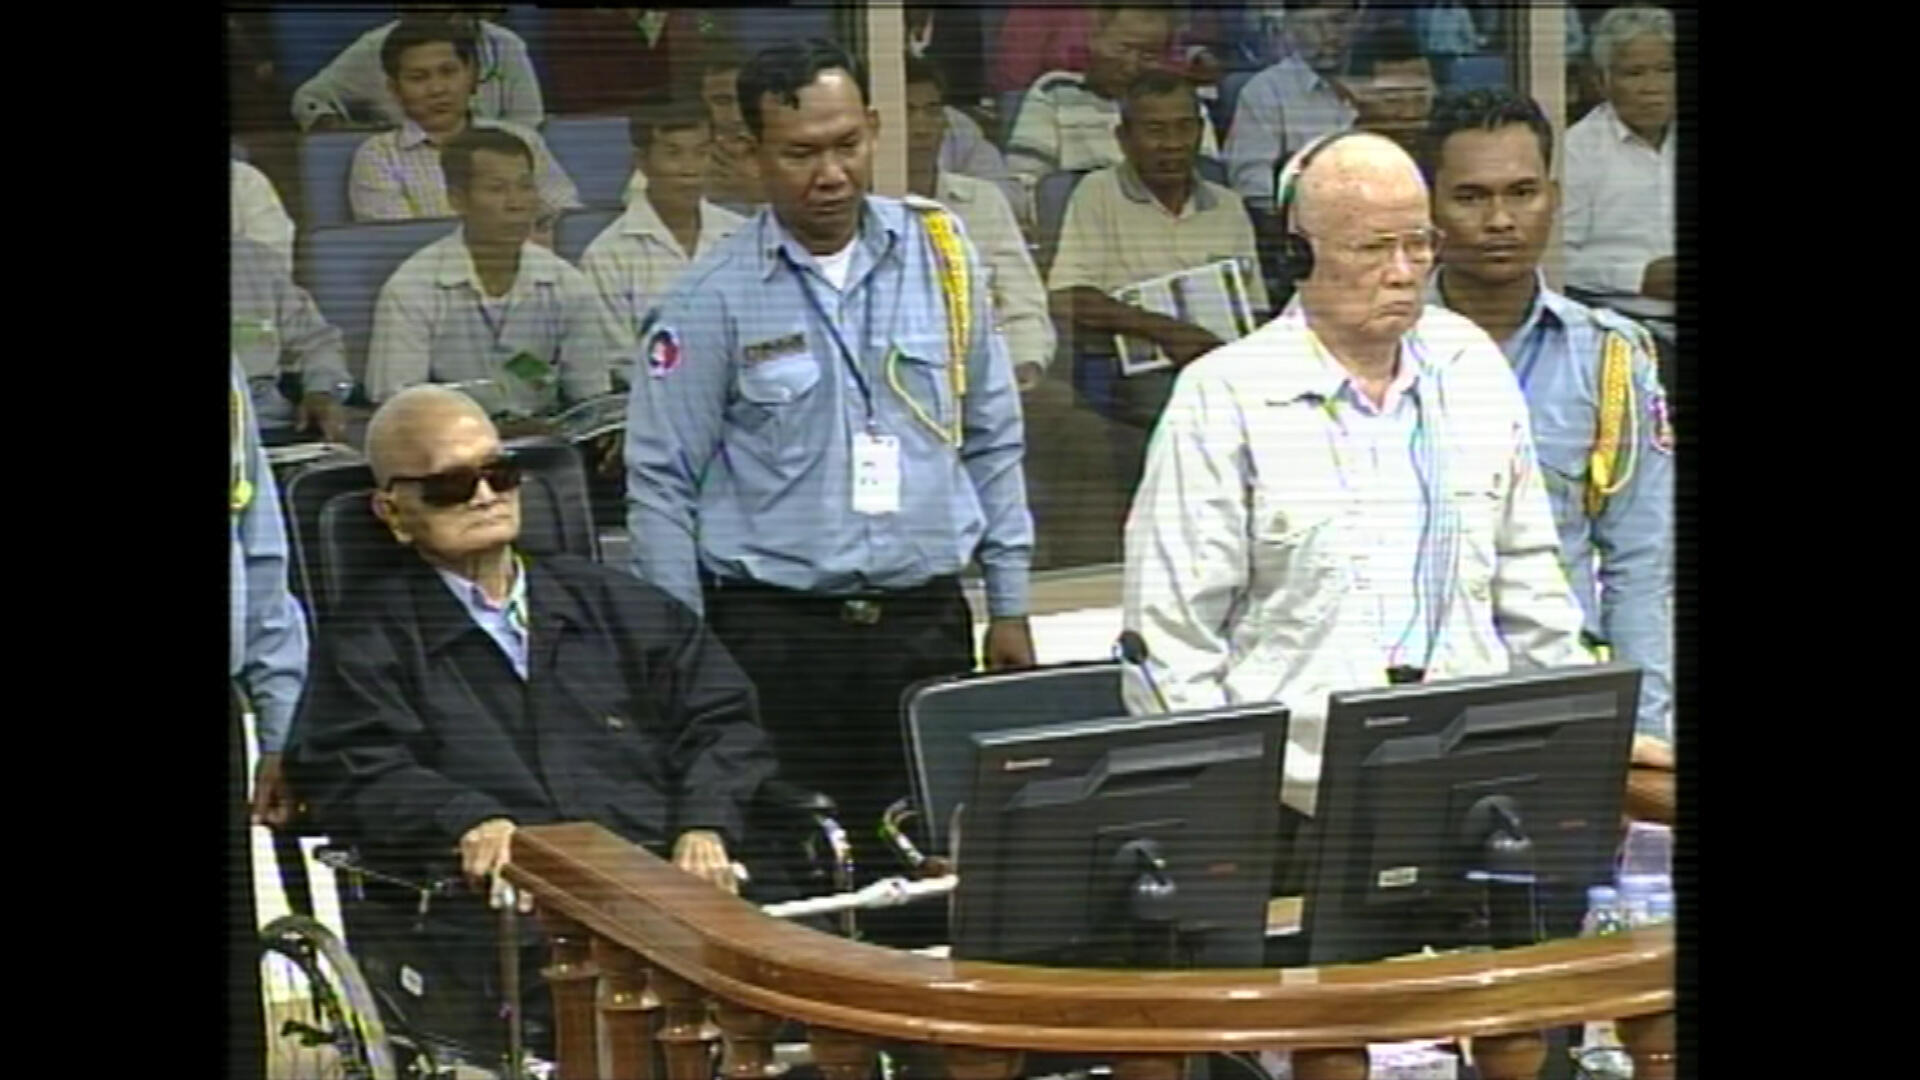 Khieu Samphan and Nuon Chea during their sentence hearing